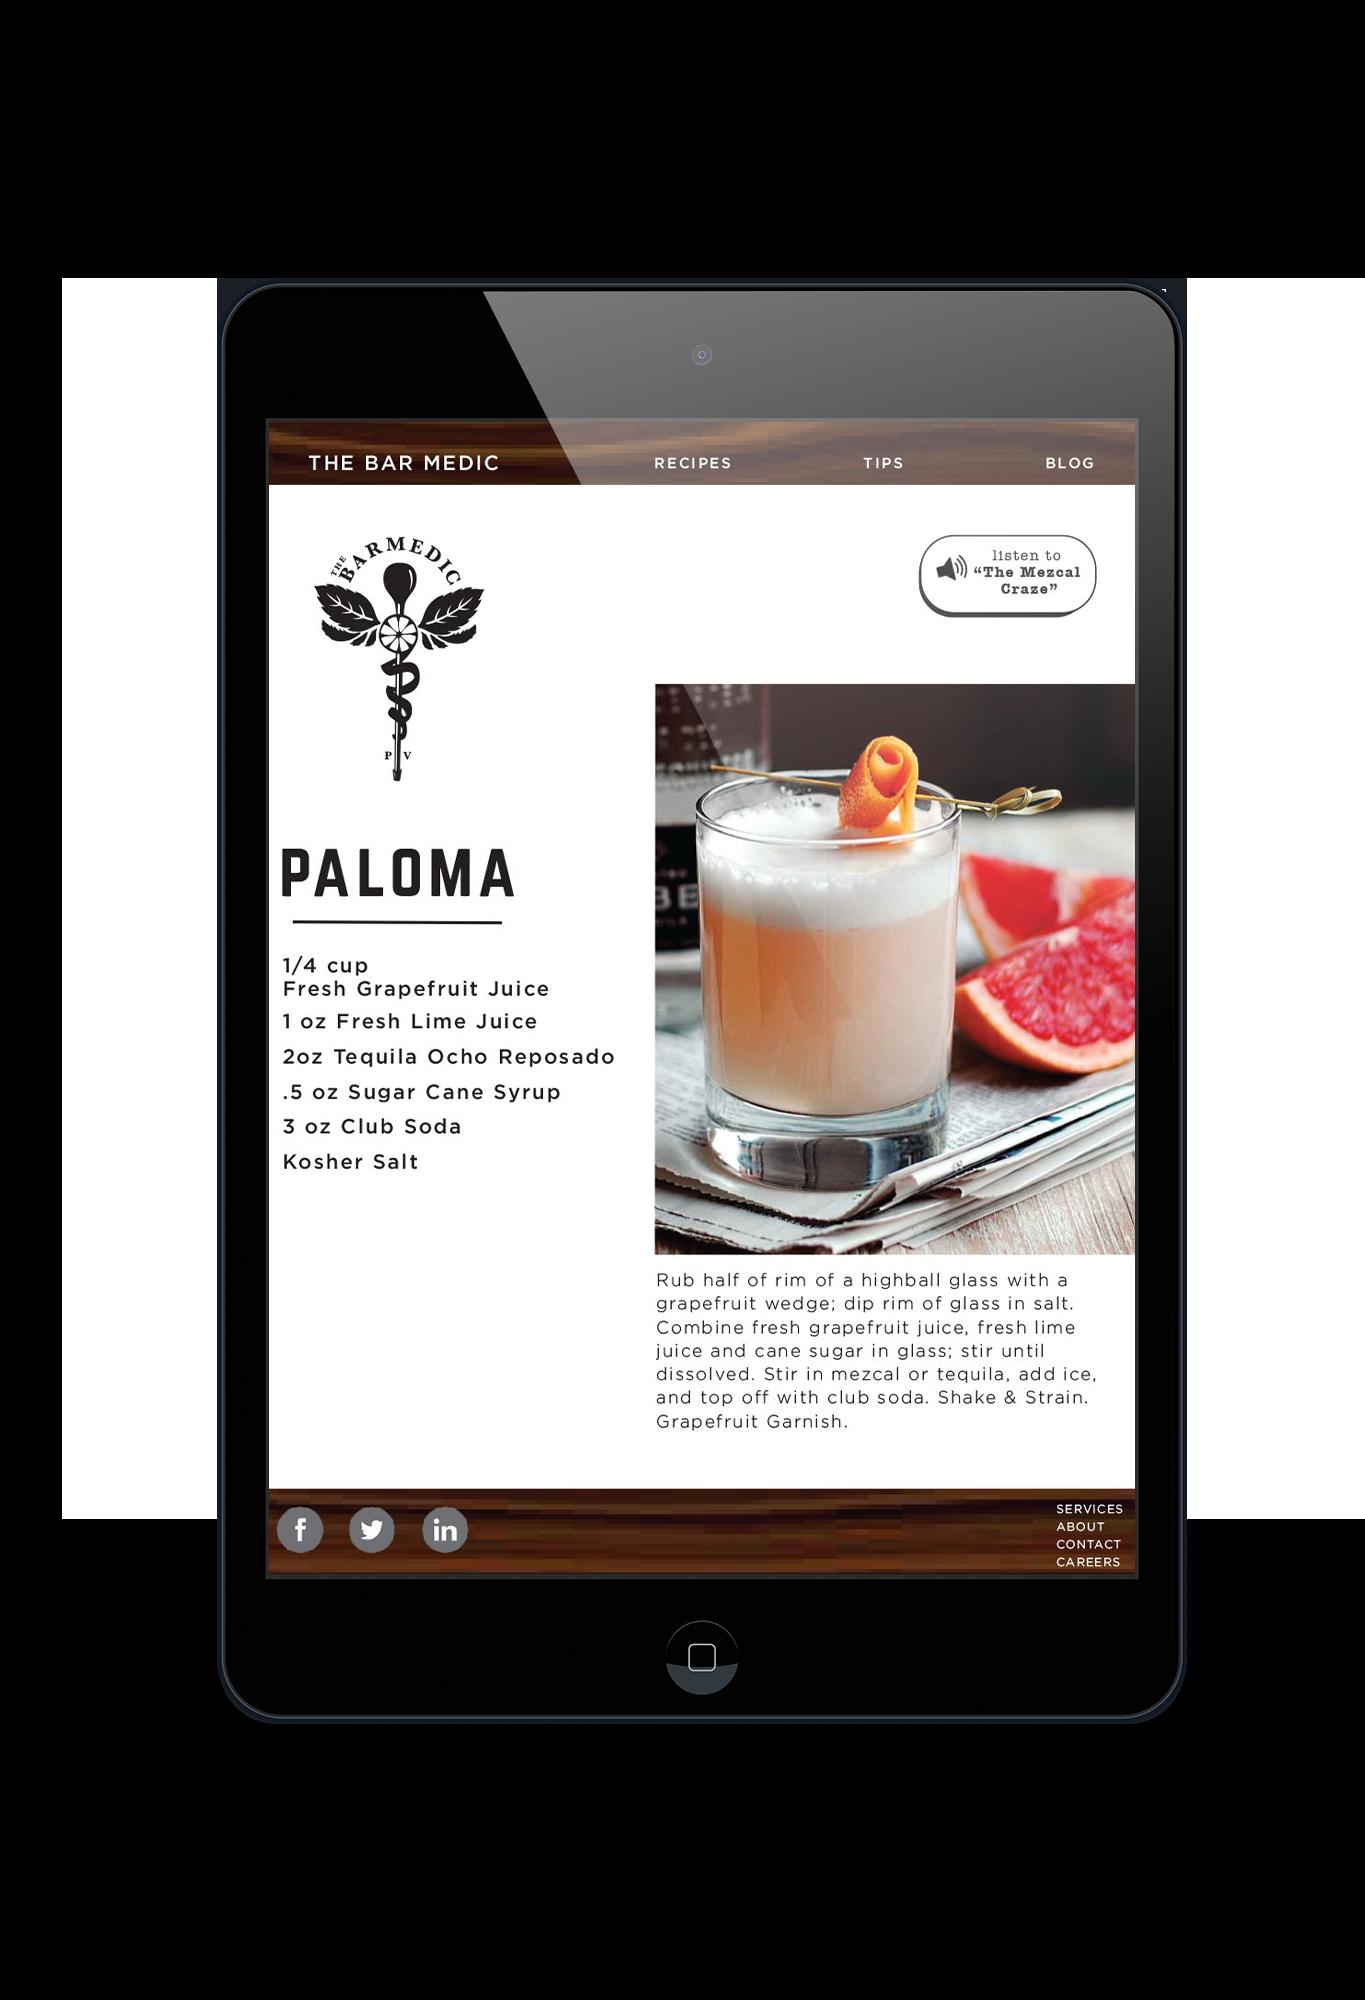 BarMedic_recipe_tablet_1.png